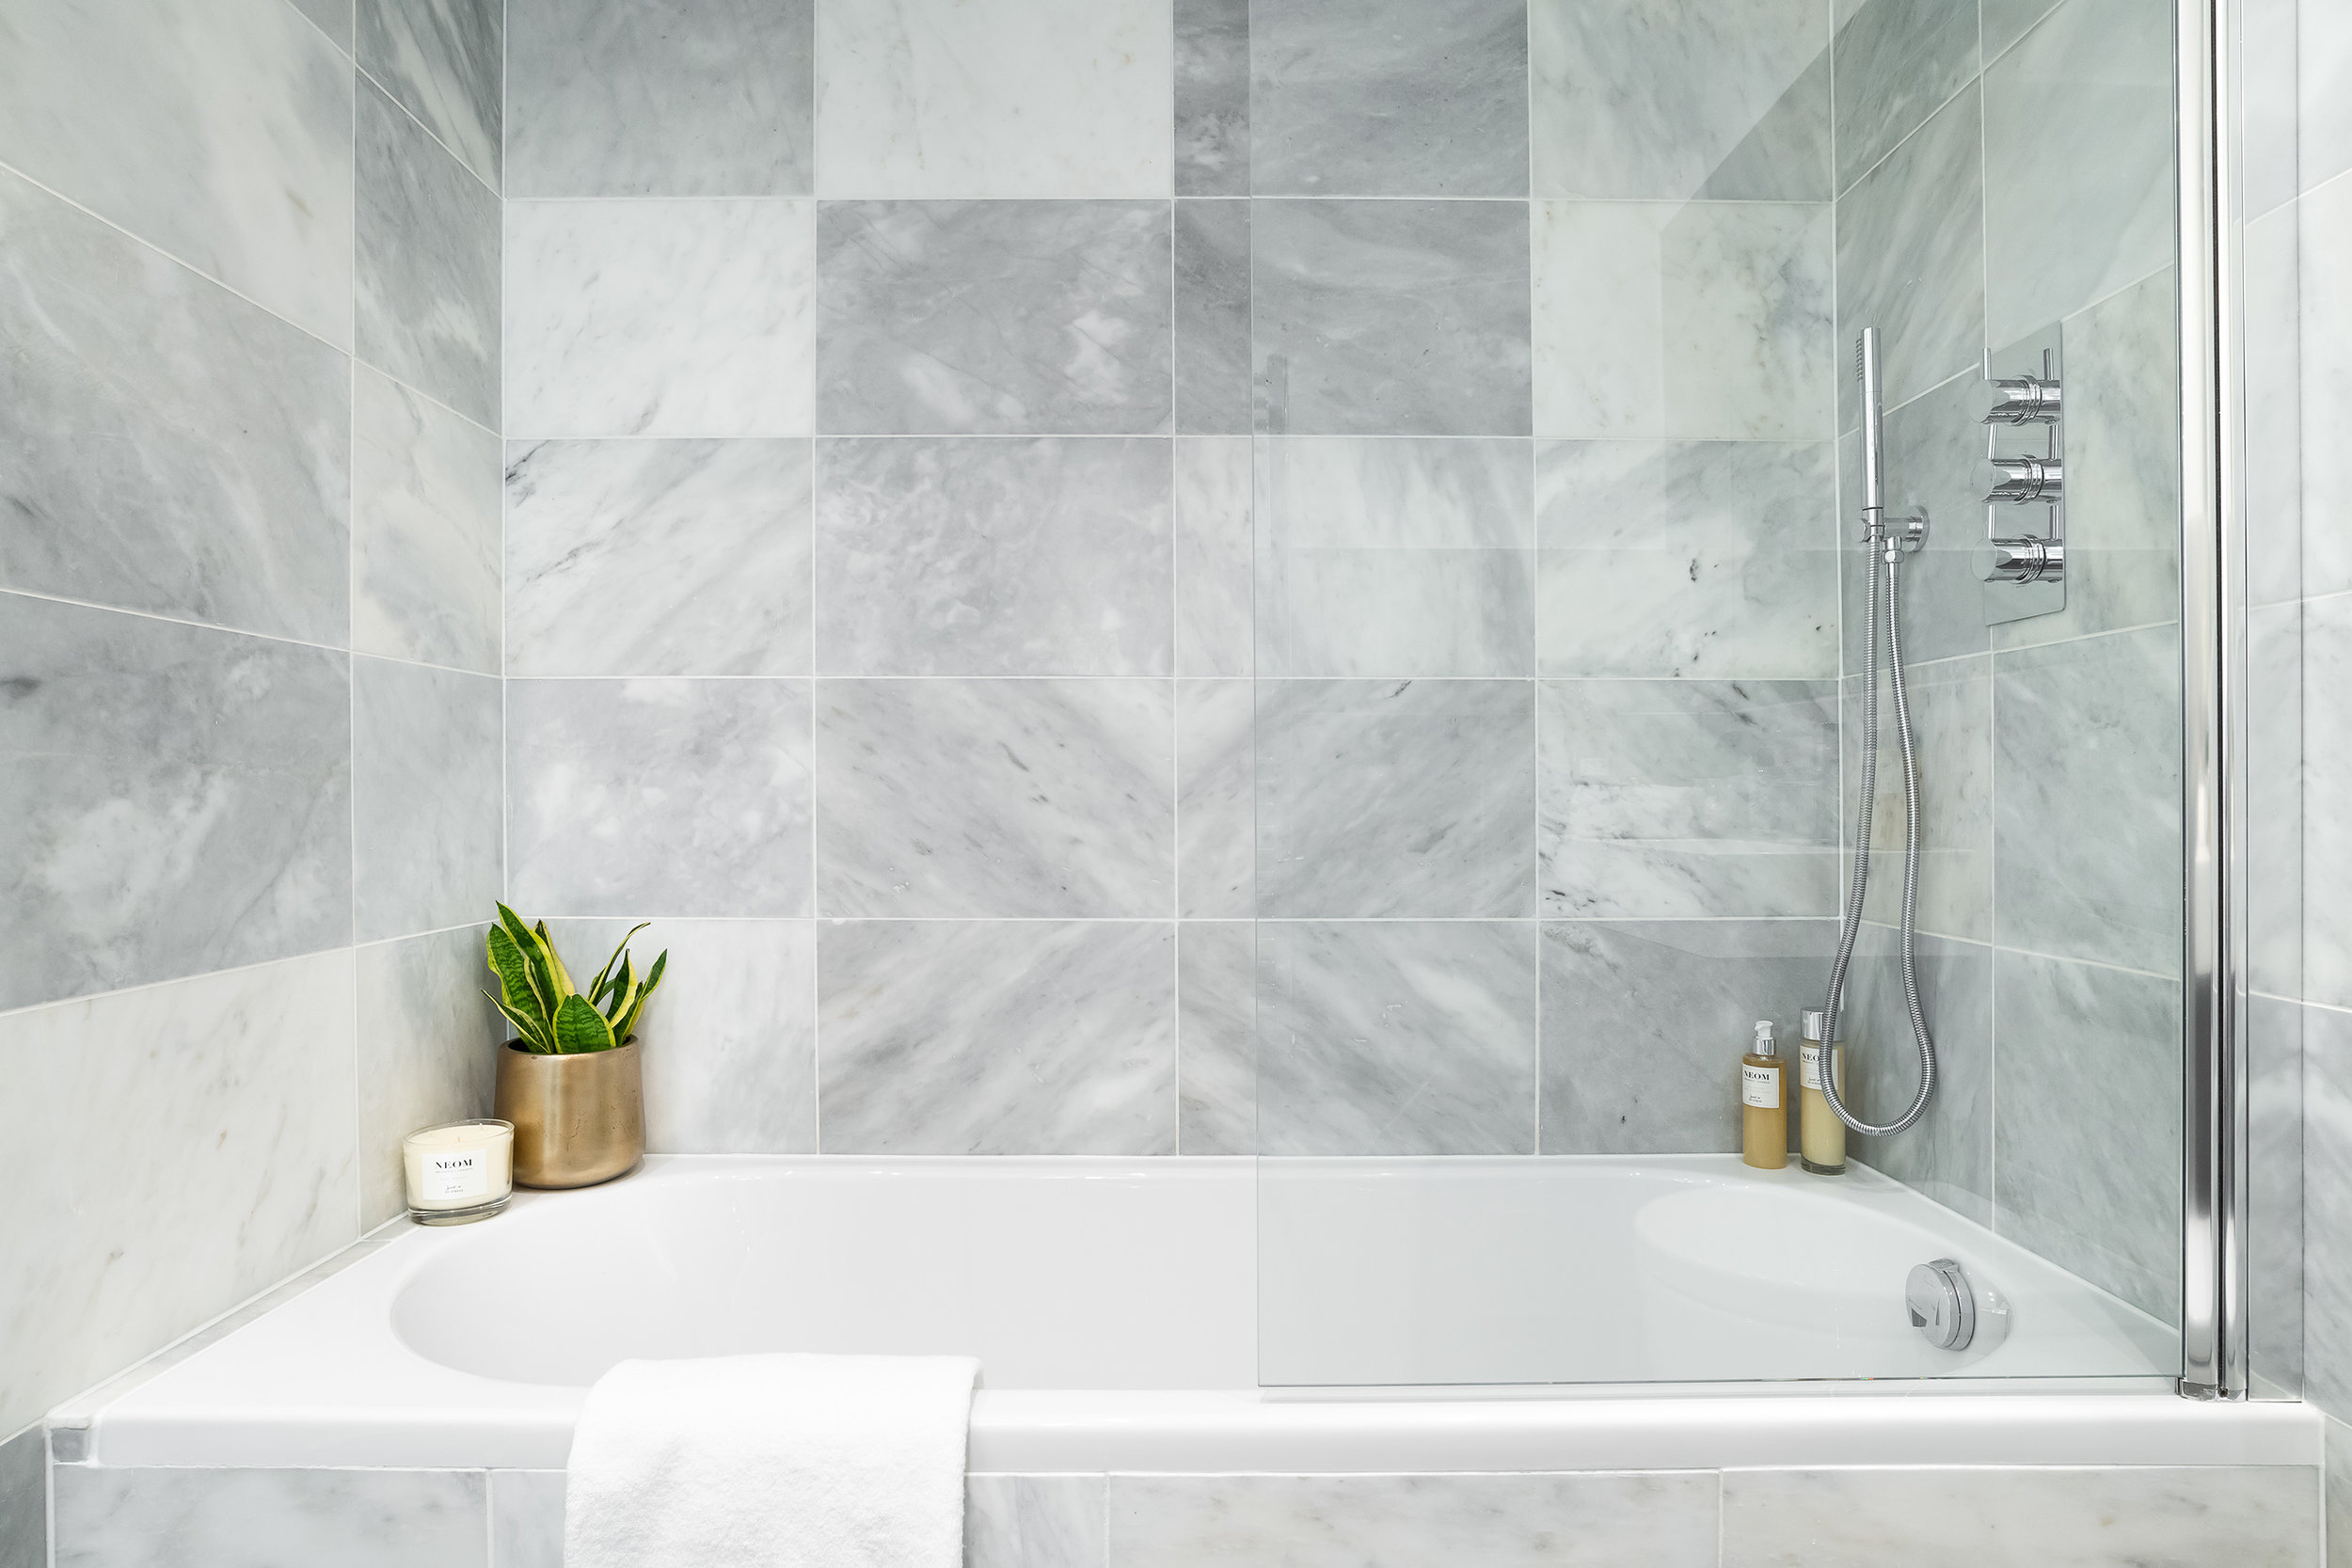 Bathroom_VR_11.jpg